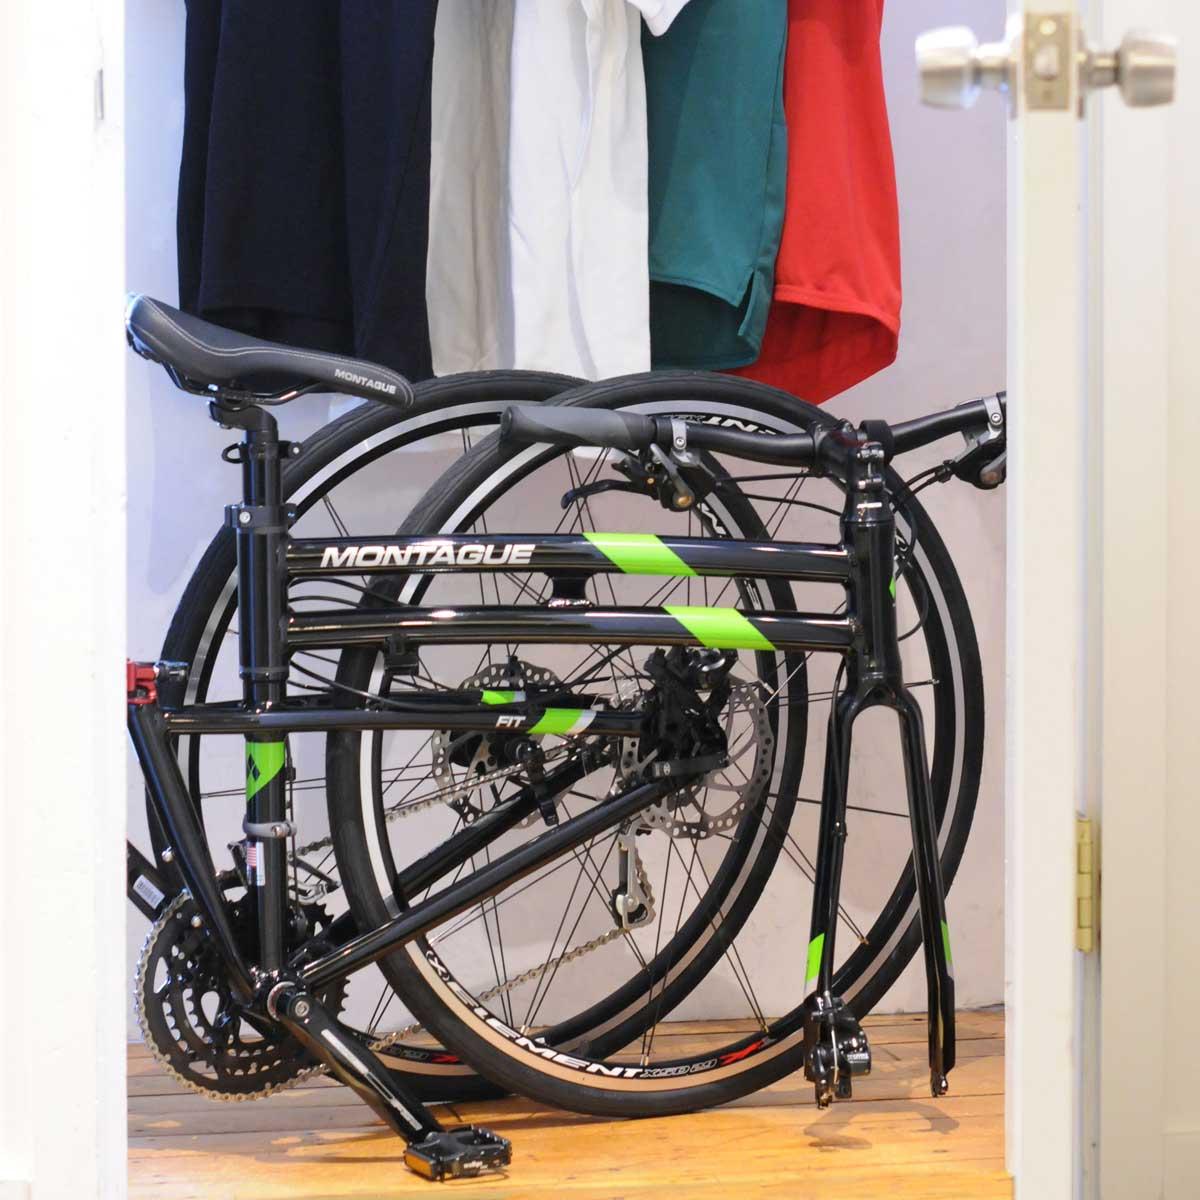 Montague Fit Folding Bike In Closet Sm